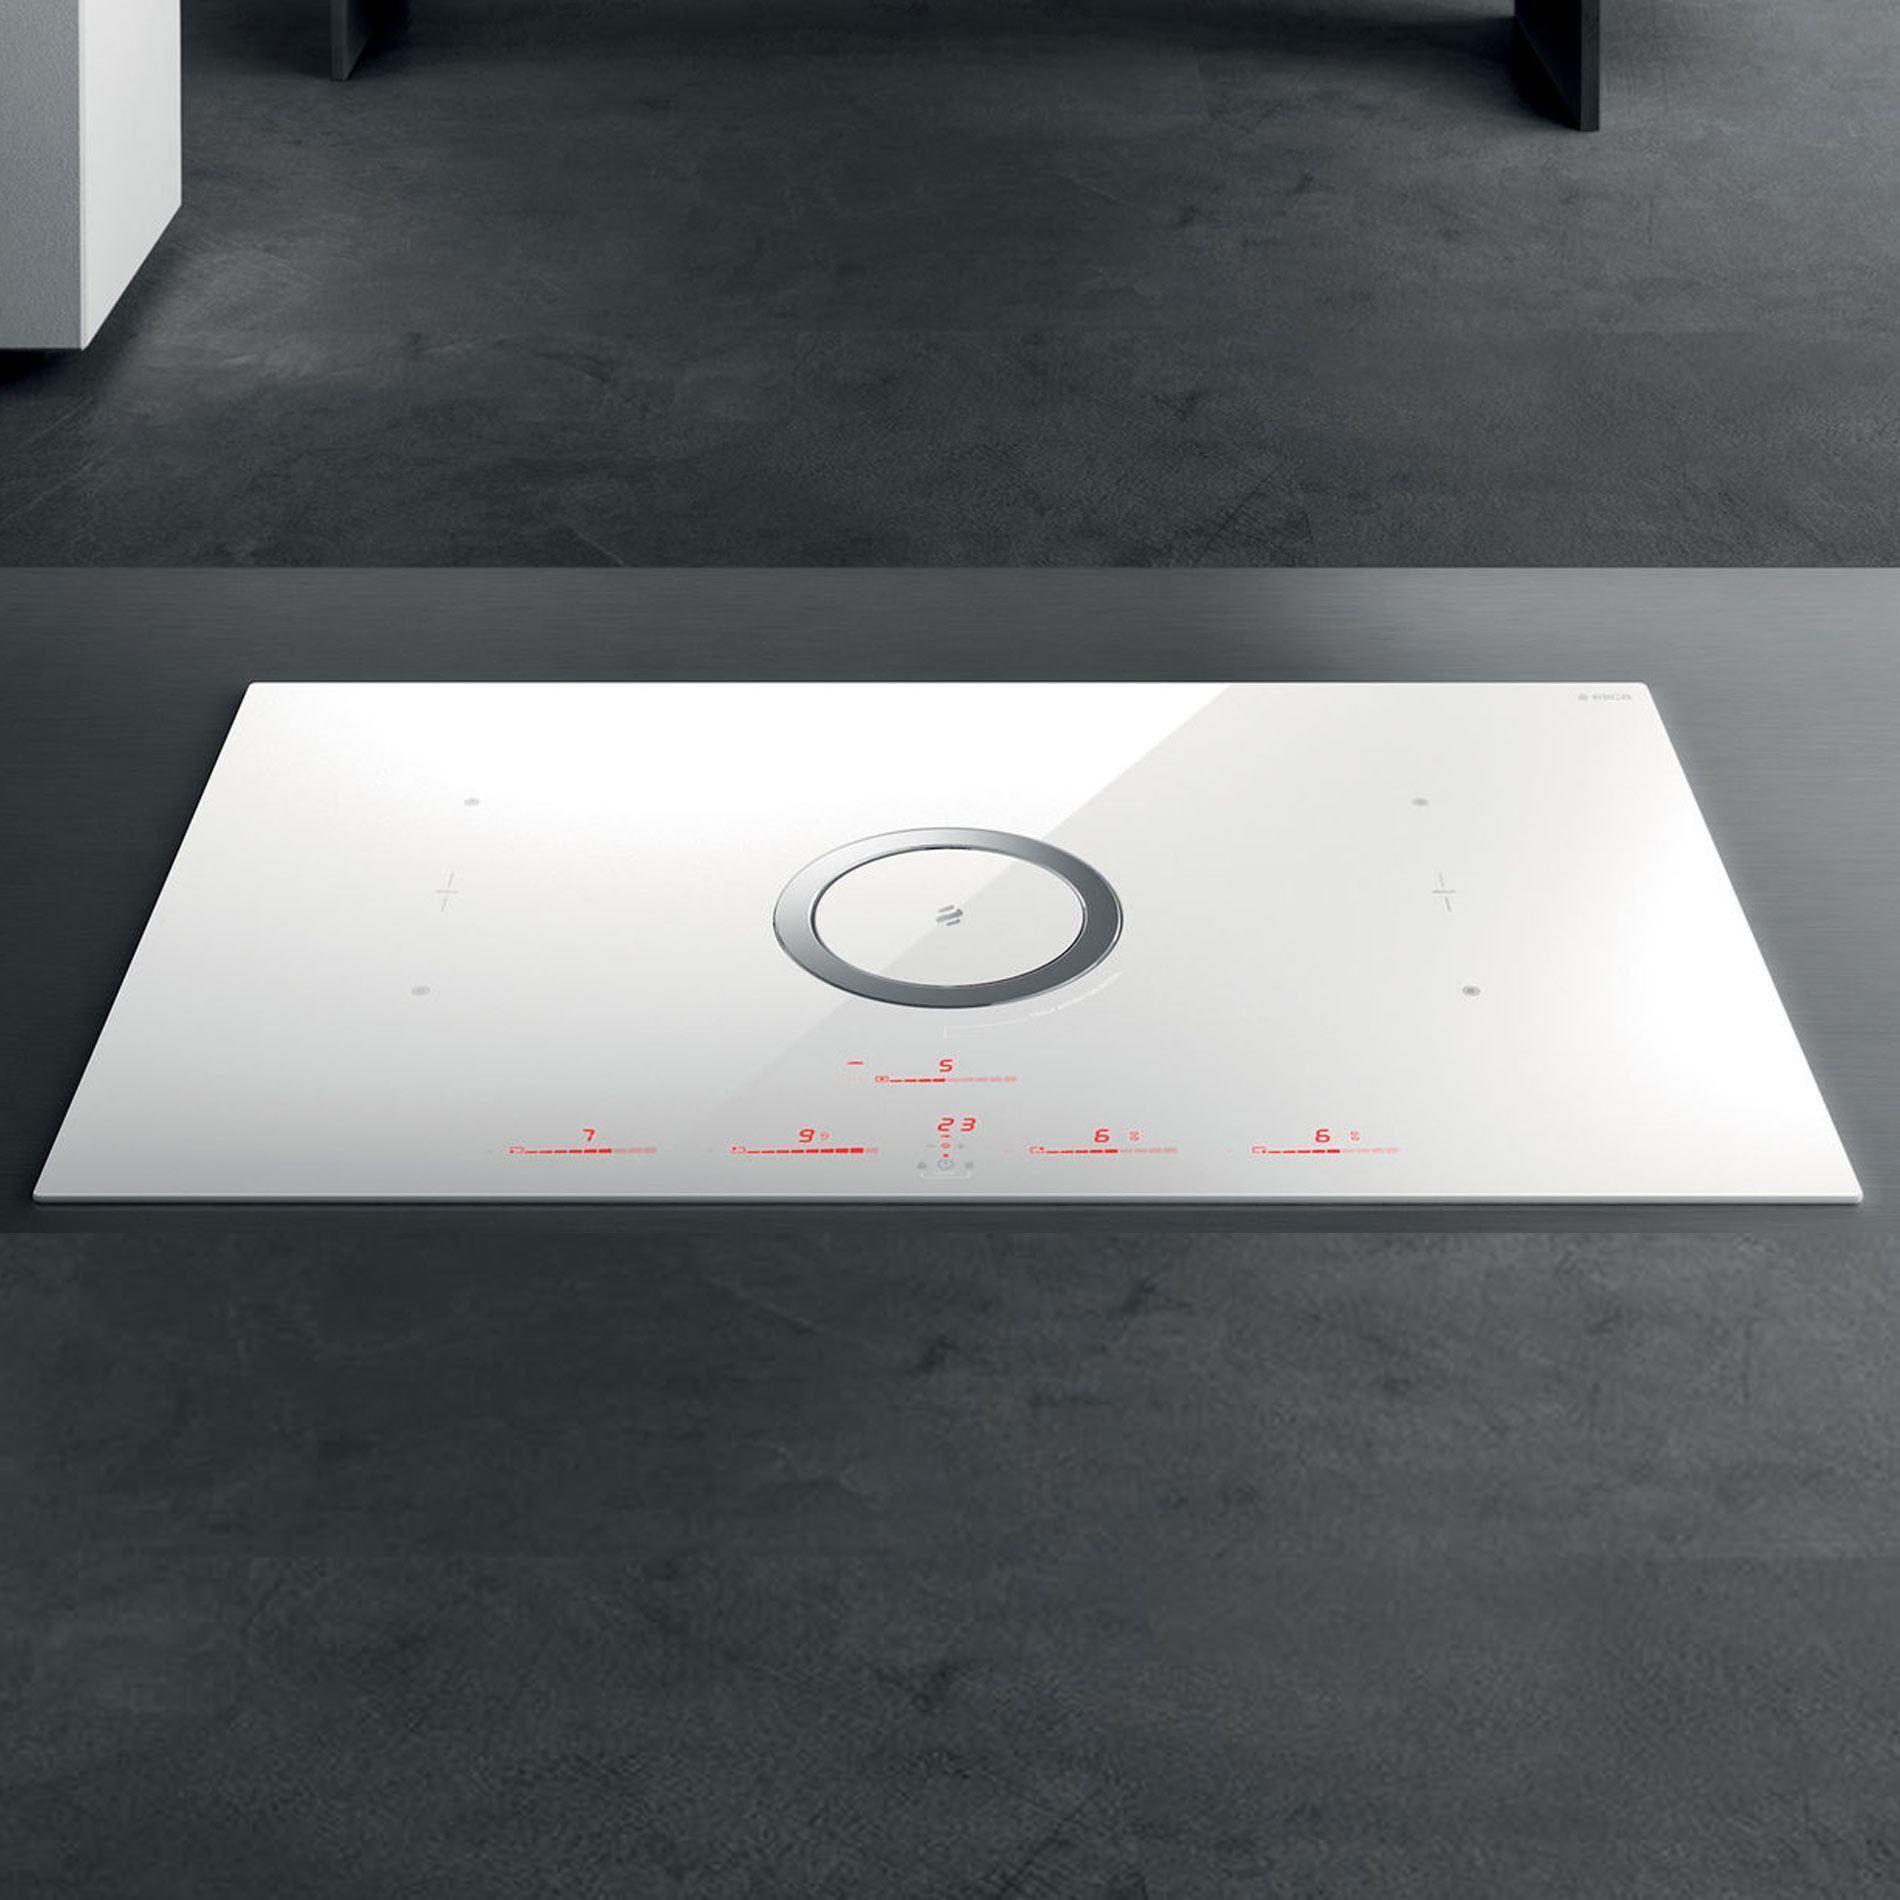 Picture of Nikolatesla White Switch - Re-circulating